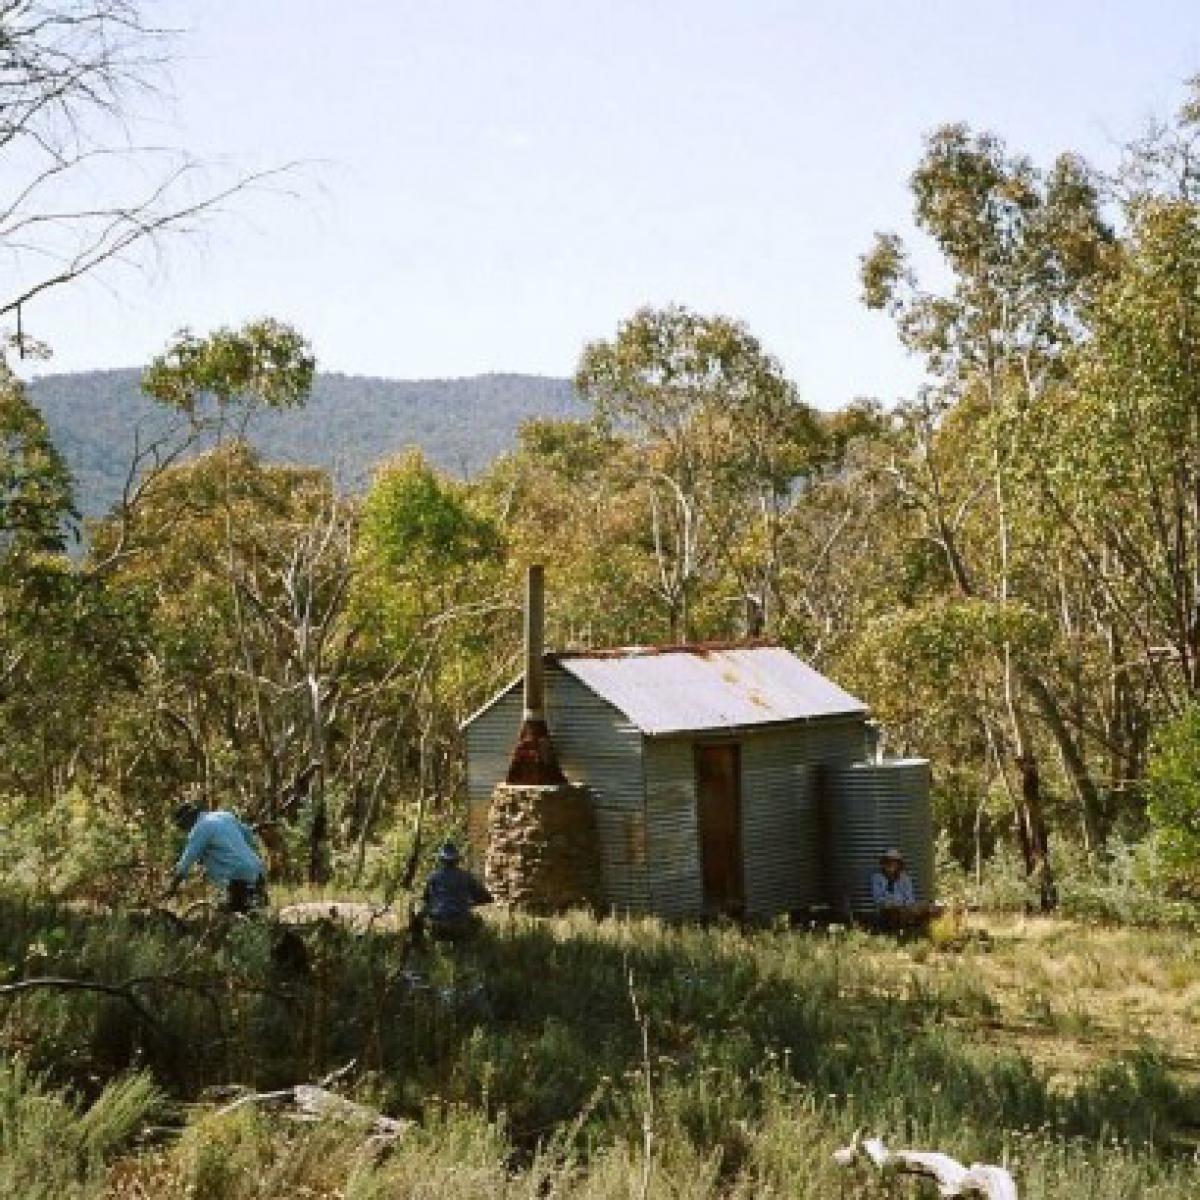 Demandering Hut, Namadgi NP